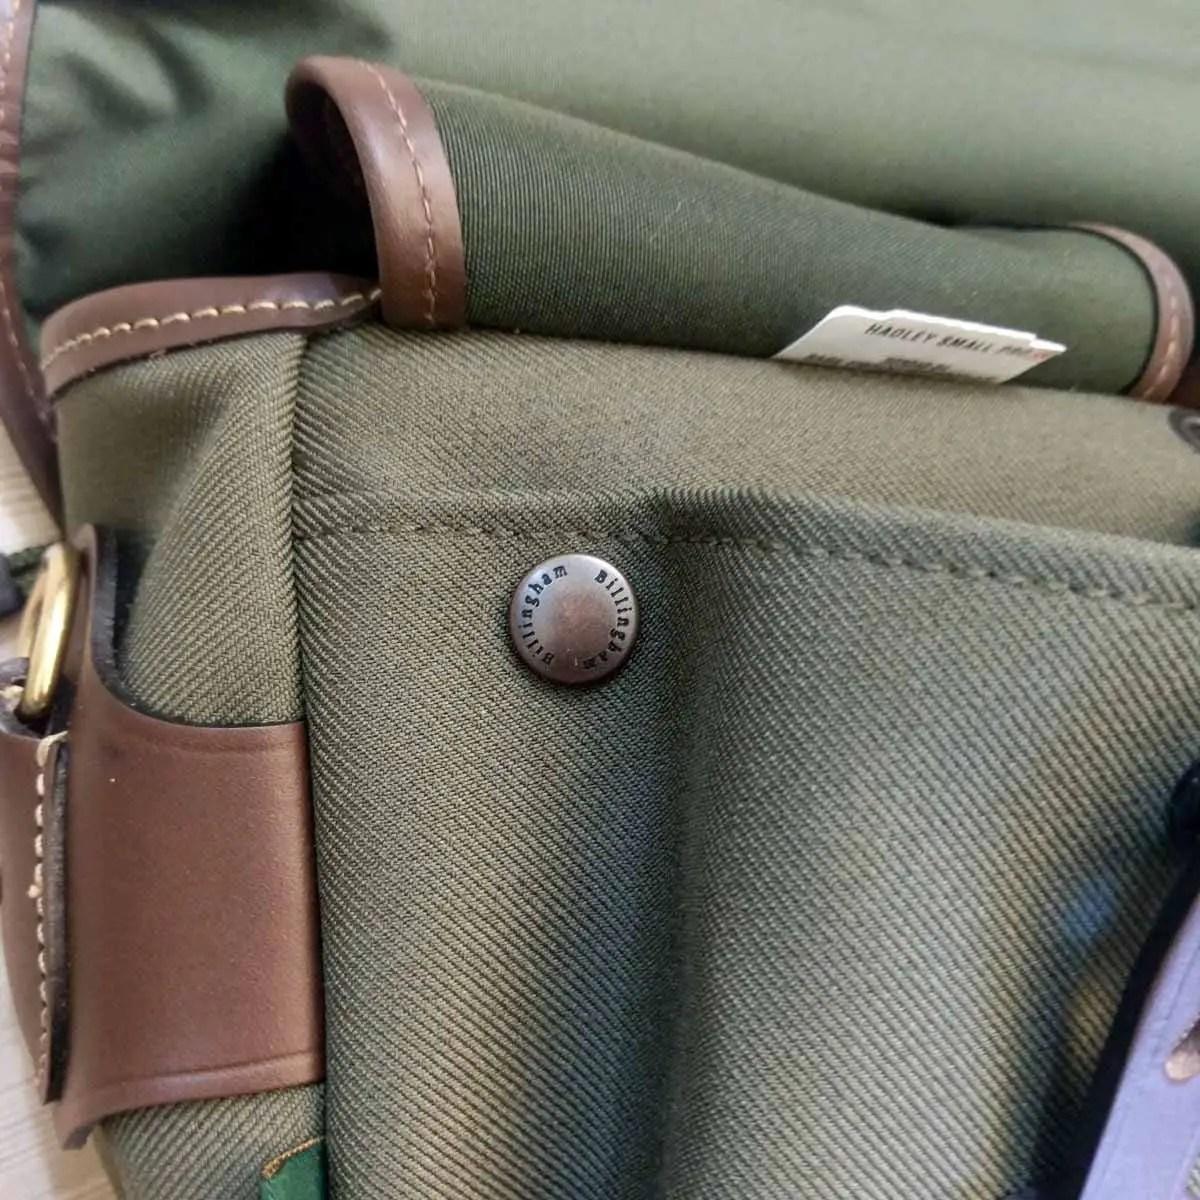 Billingham Hadley Small Pro - Dump pocket button closed 01